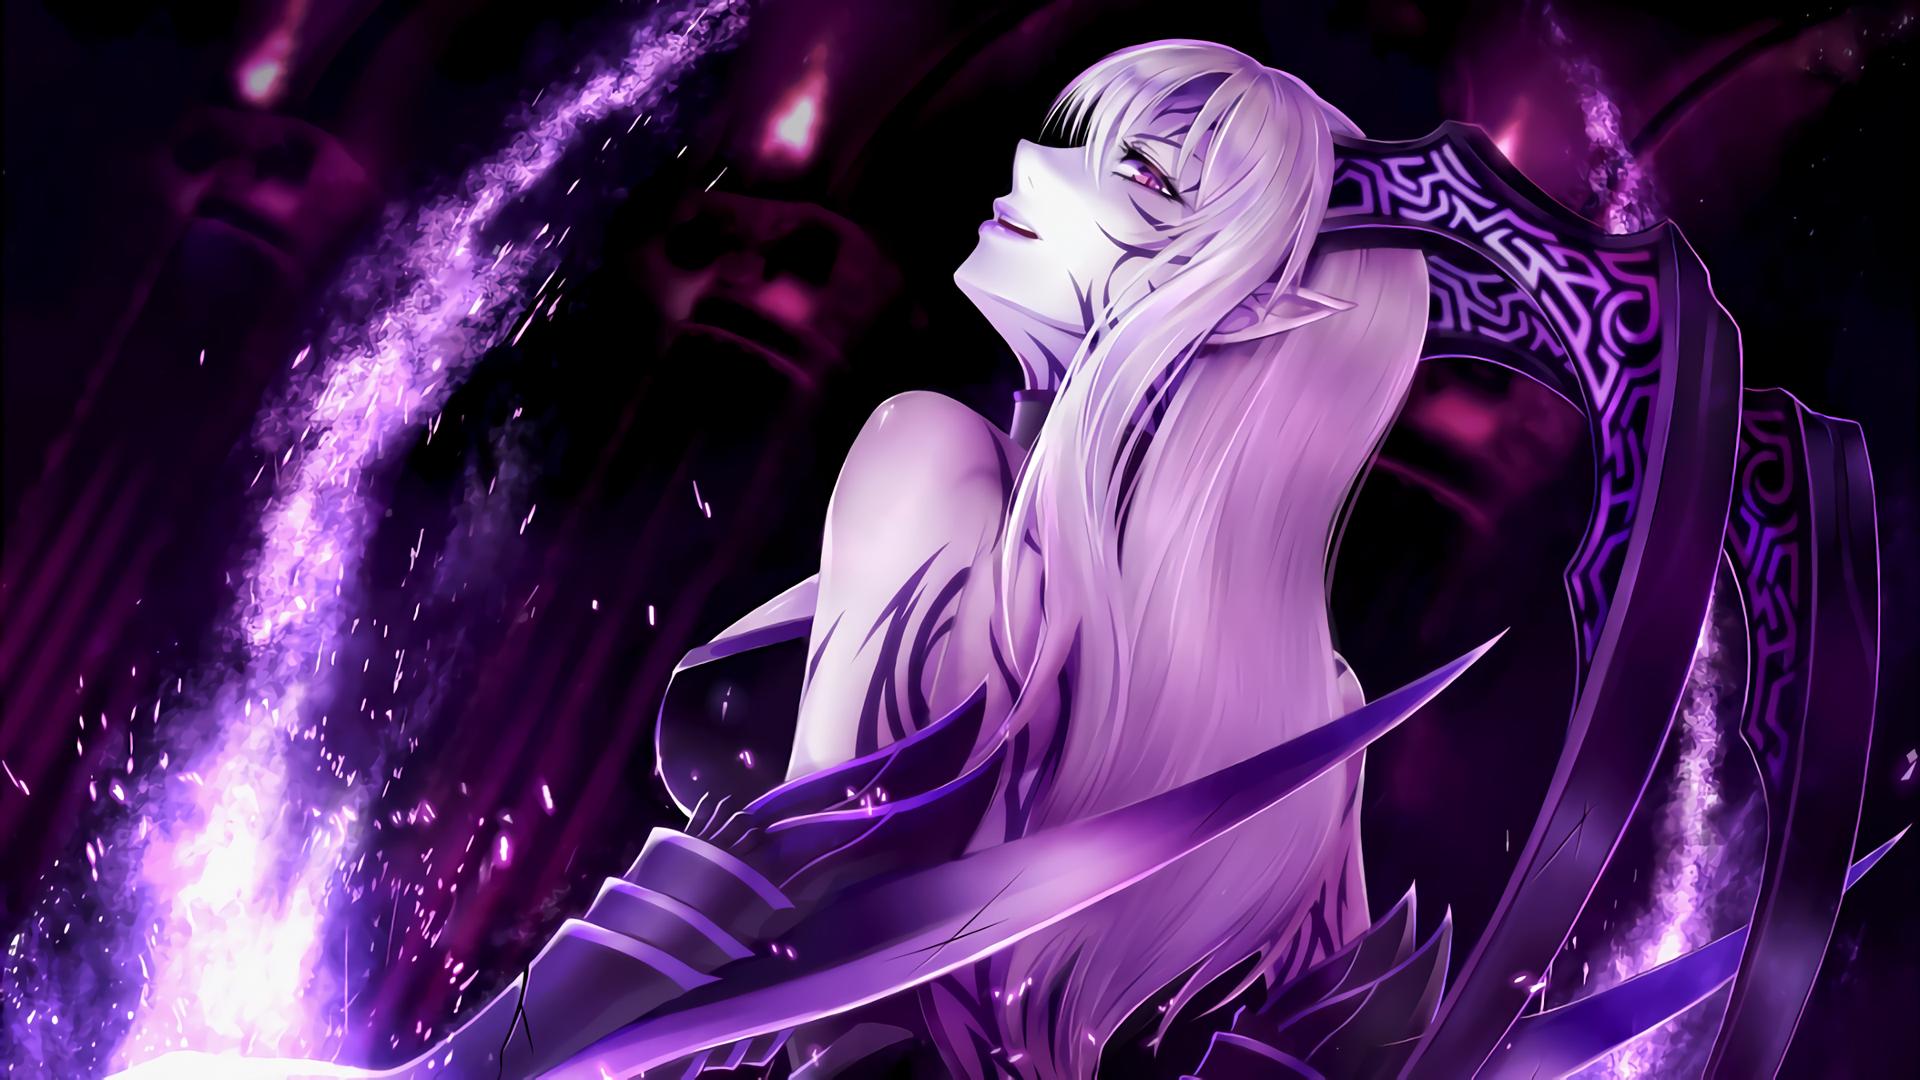 Wallpaper : anime, demon 1920x1080 - rudrachl - 1375235 ...